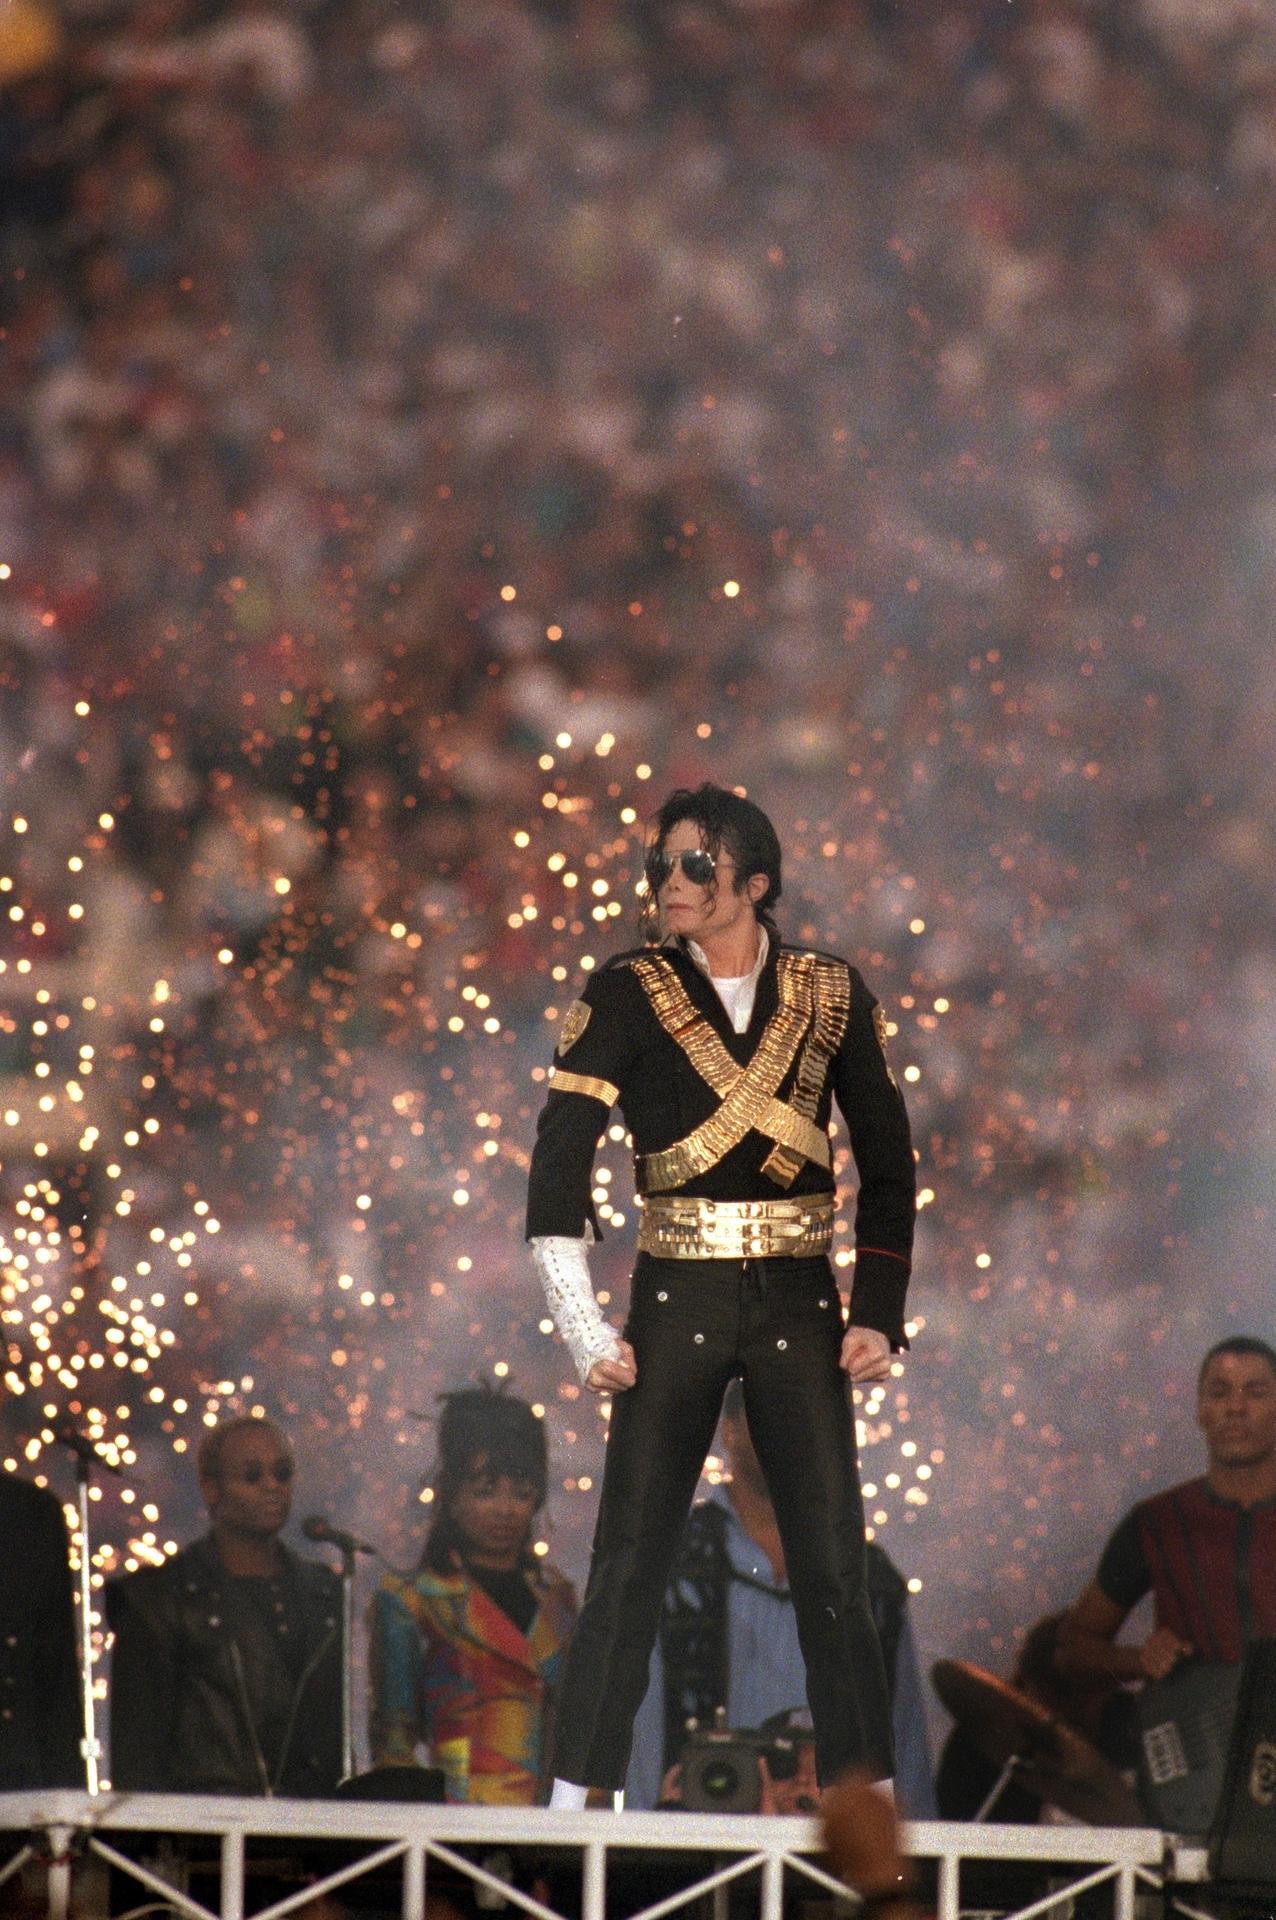 Januar 1993: Hier Hat Michael Jackson Seinen Zweiten intended for Michael Jackson Super Bowl